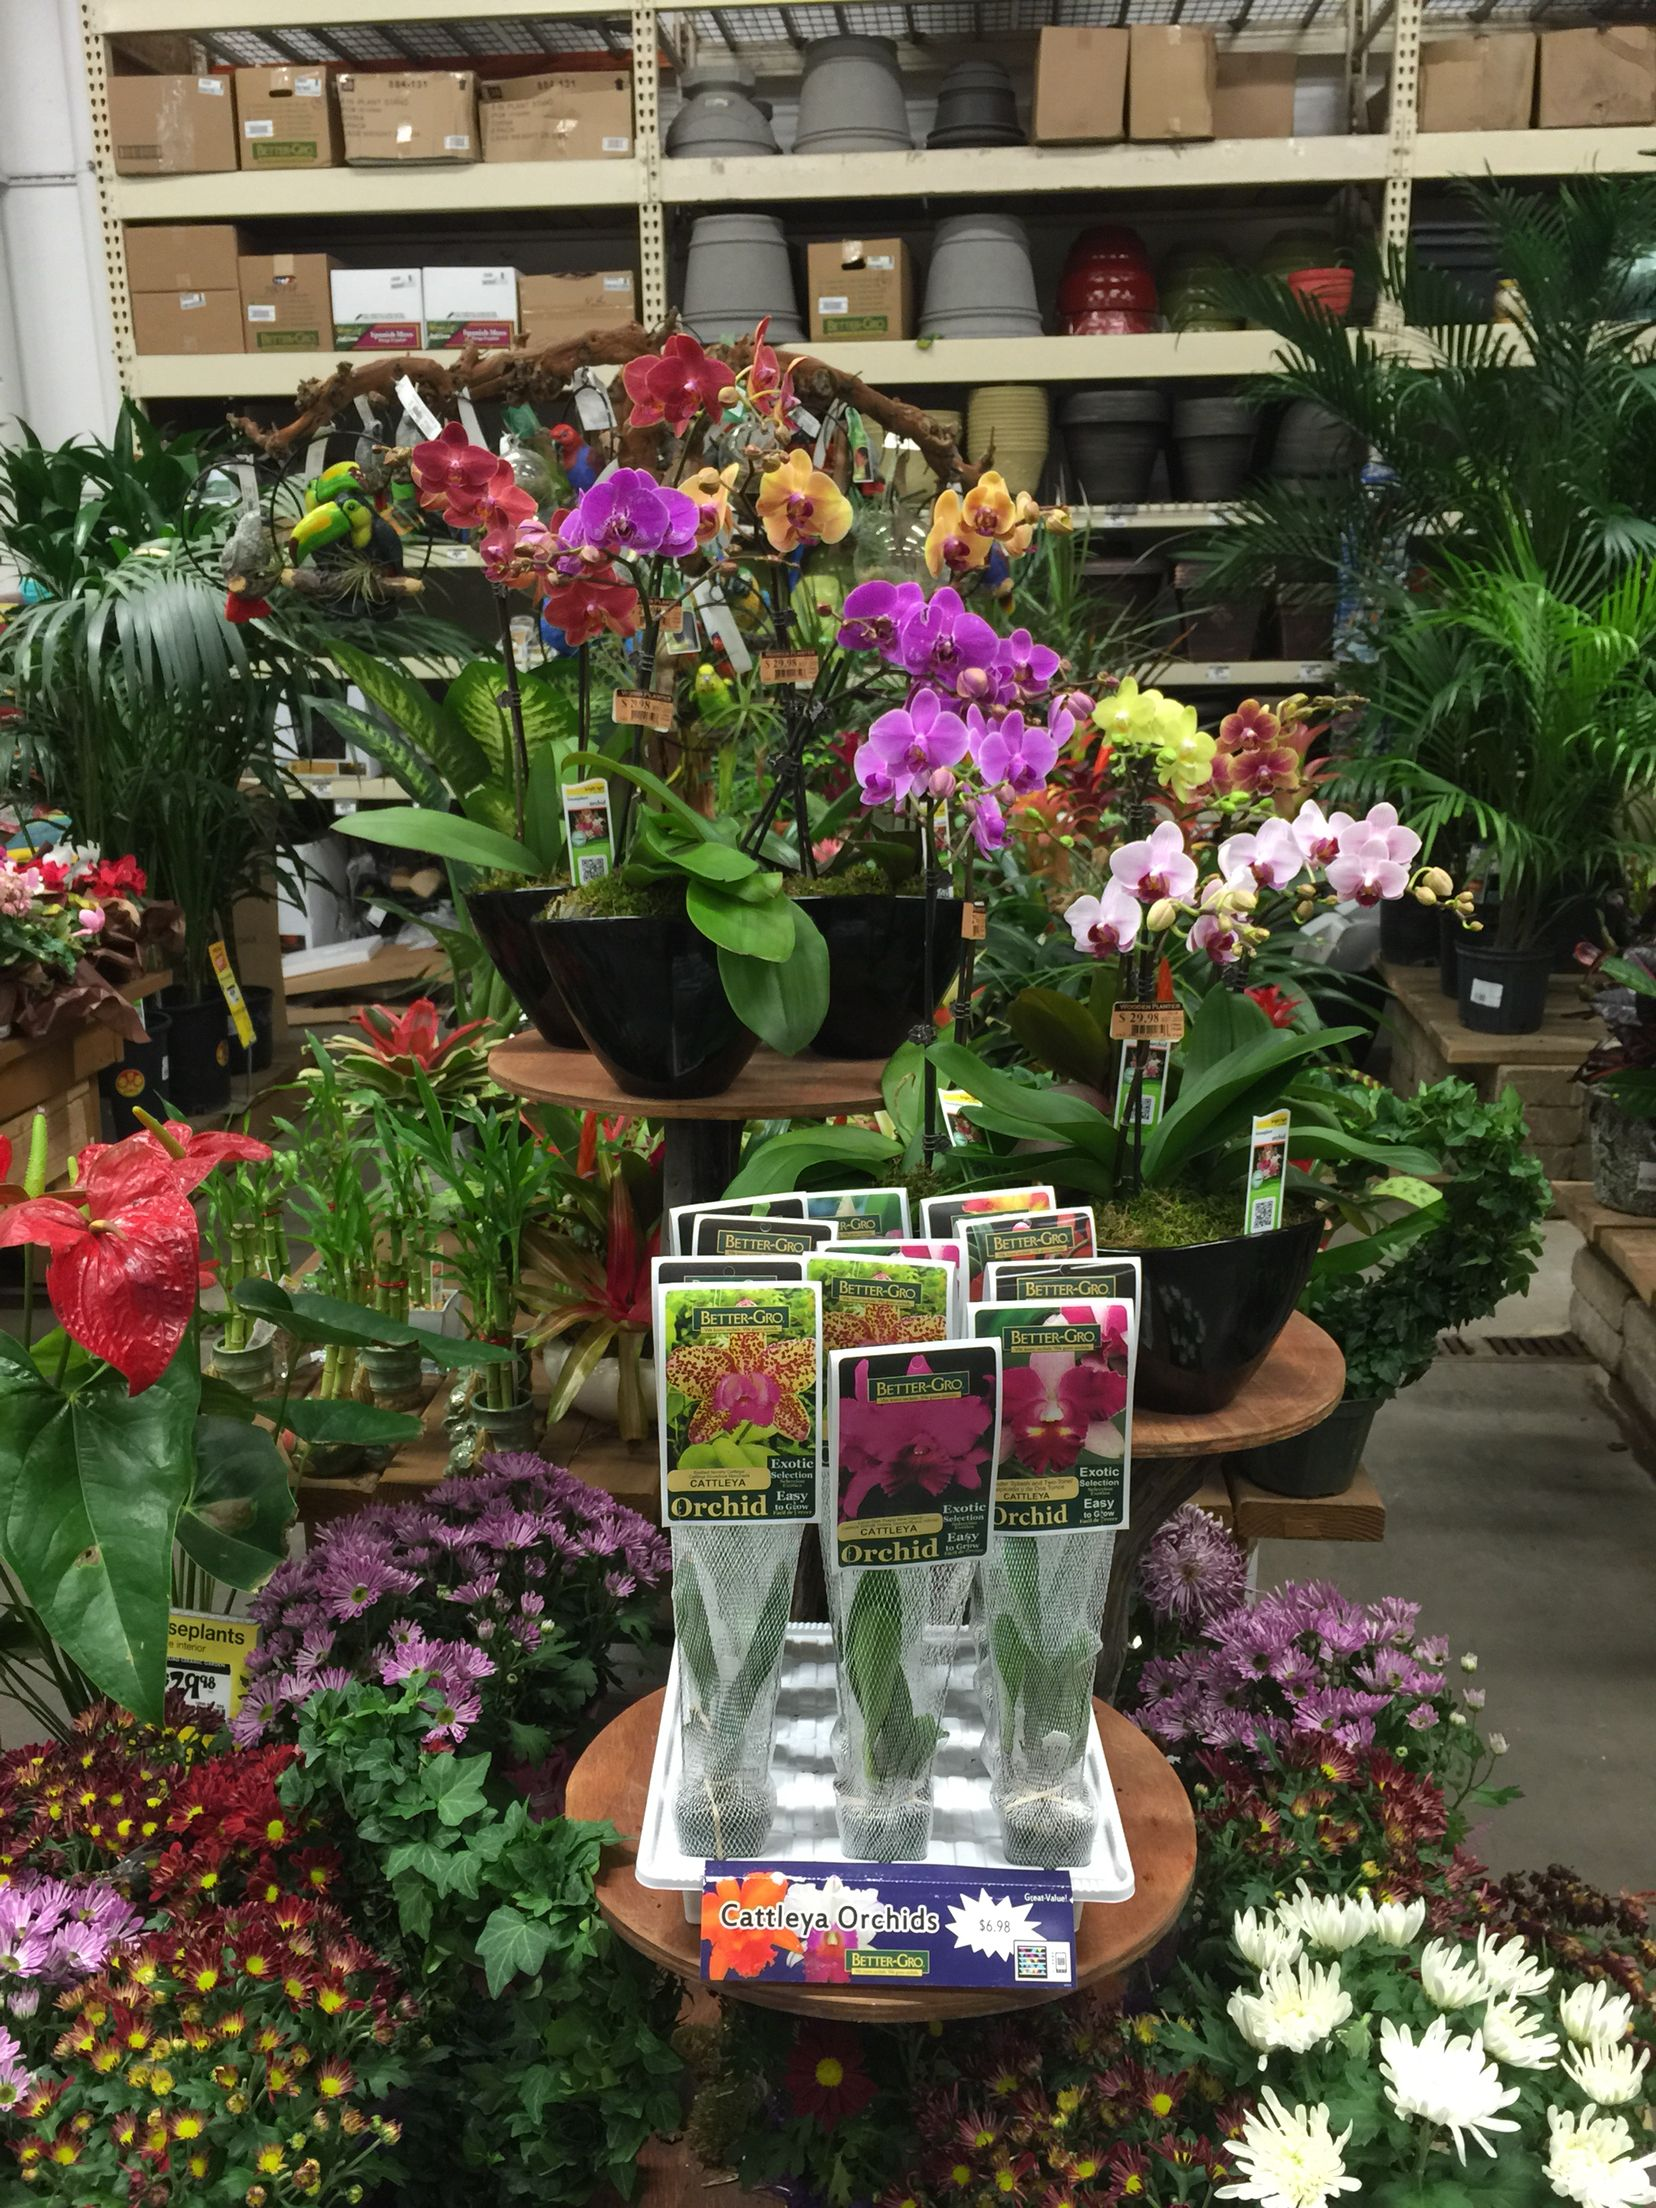 Home depot mira loma poinsettia plant hibiscus plant